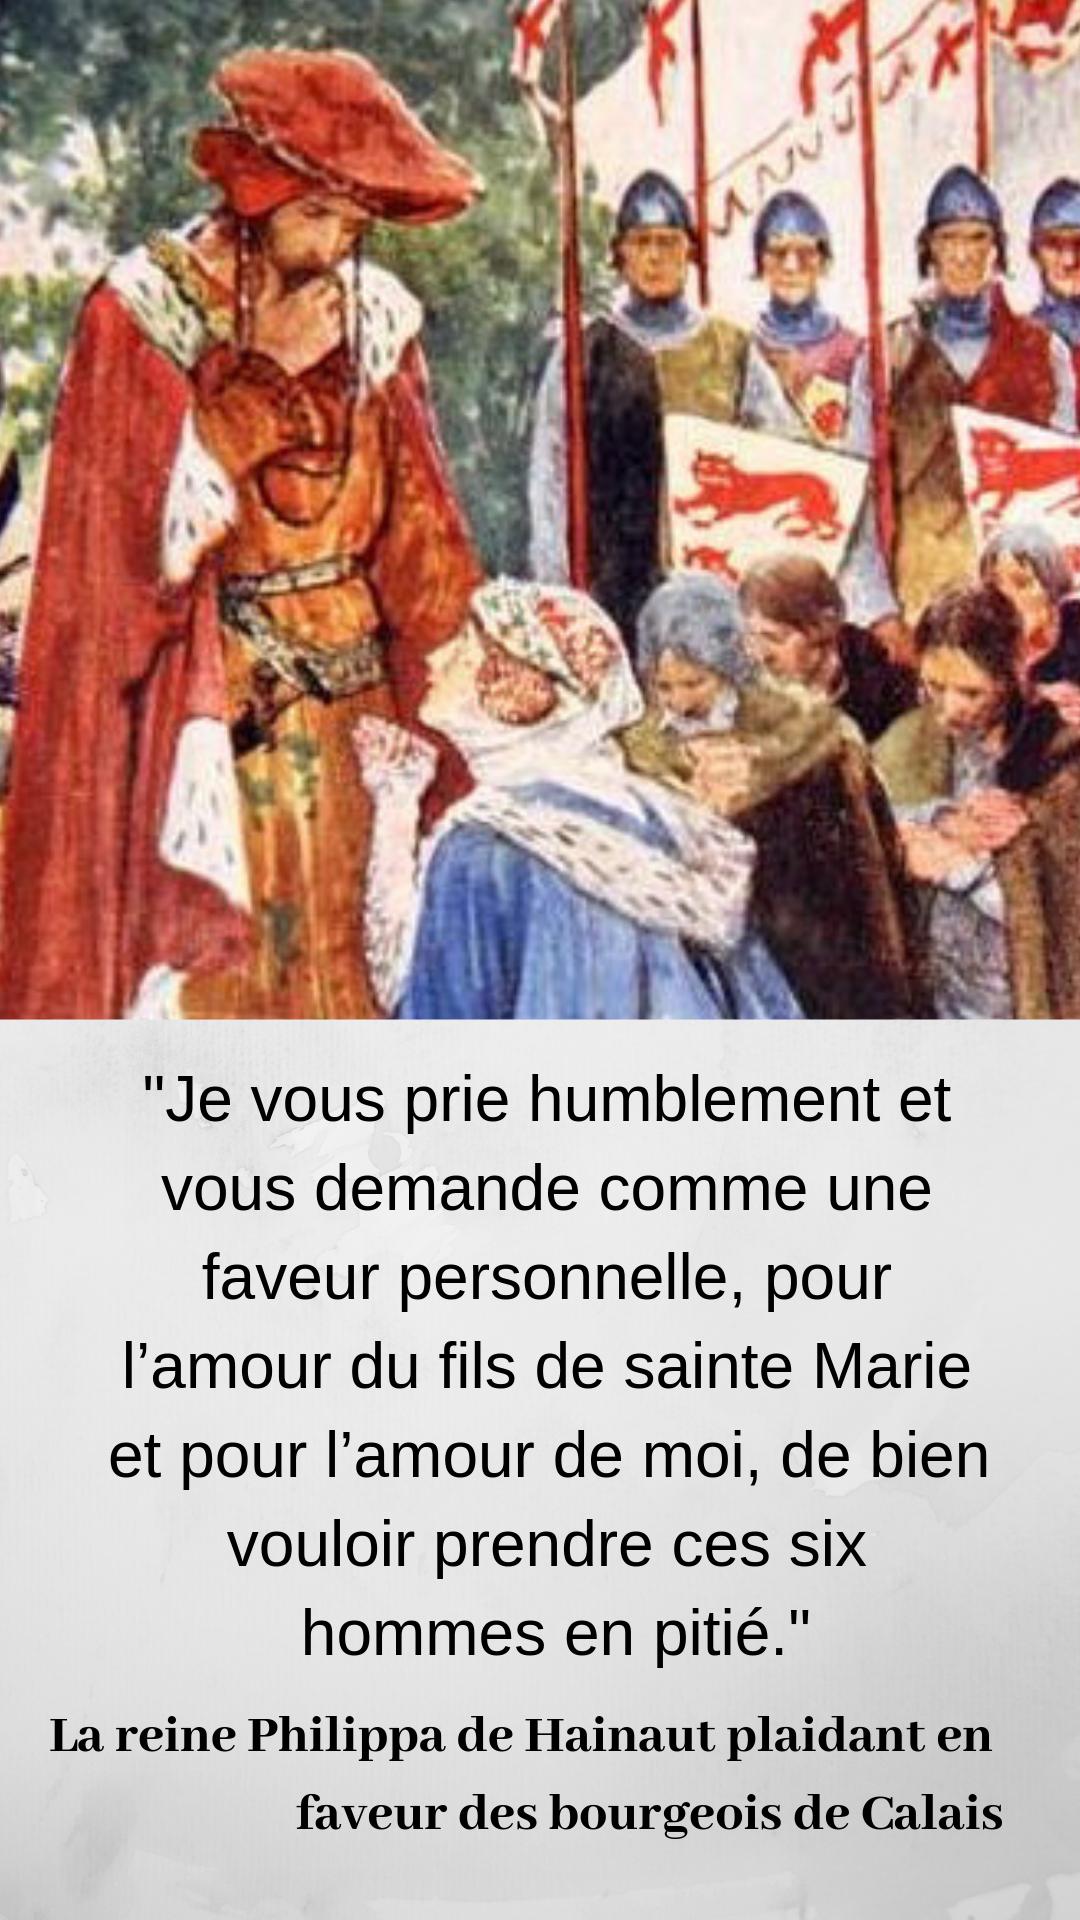 7 Octobre 1337 Debut De La Guerre De Cent Ans Guerre De Cent Ans Guerre Les Bourgeois De Calais